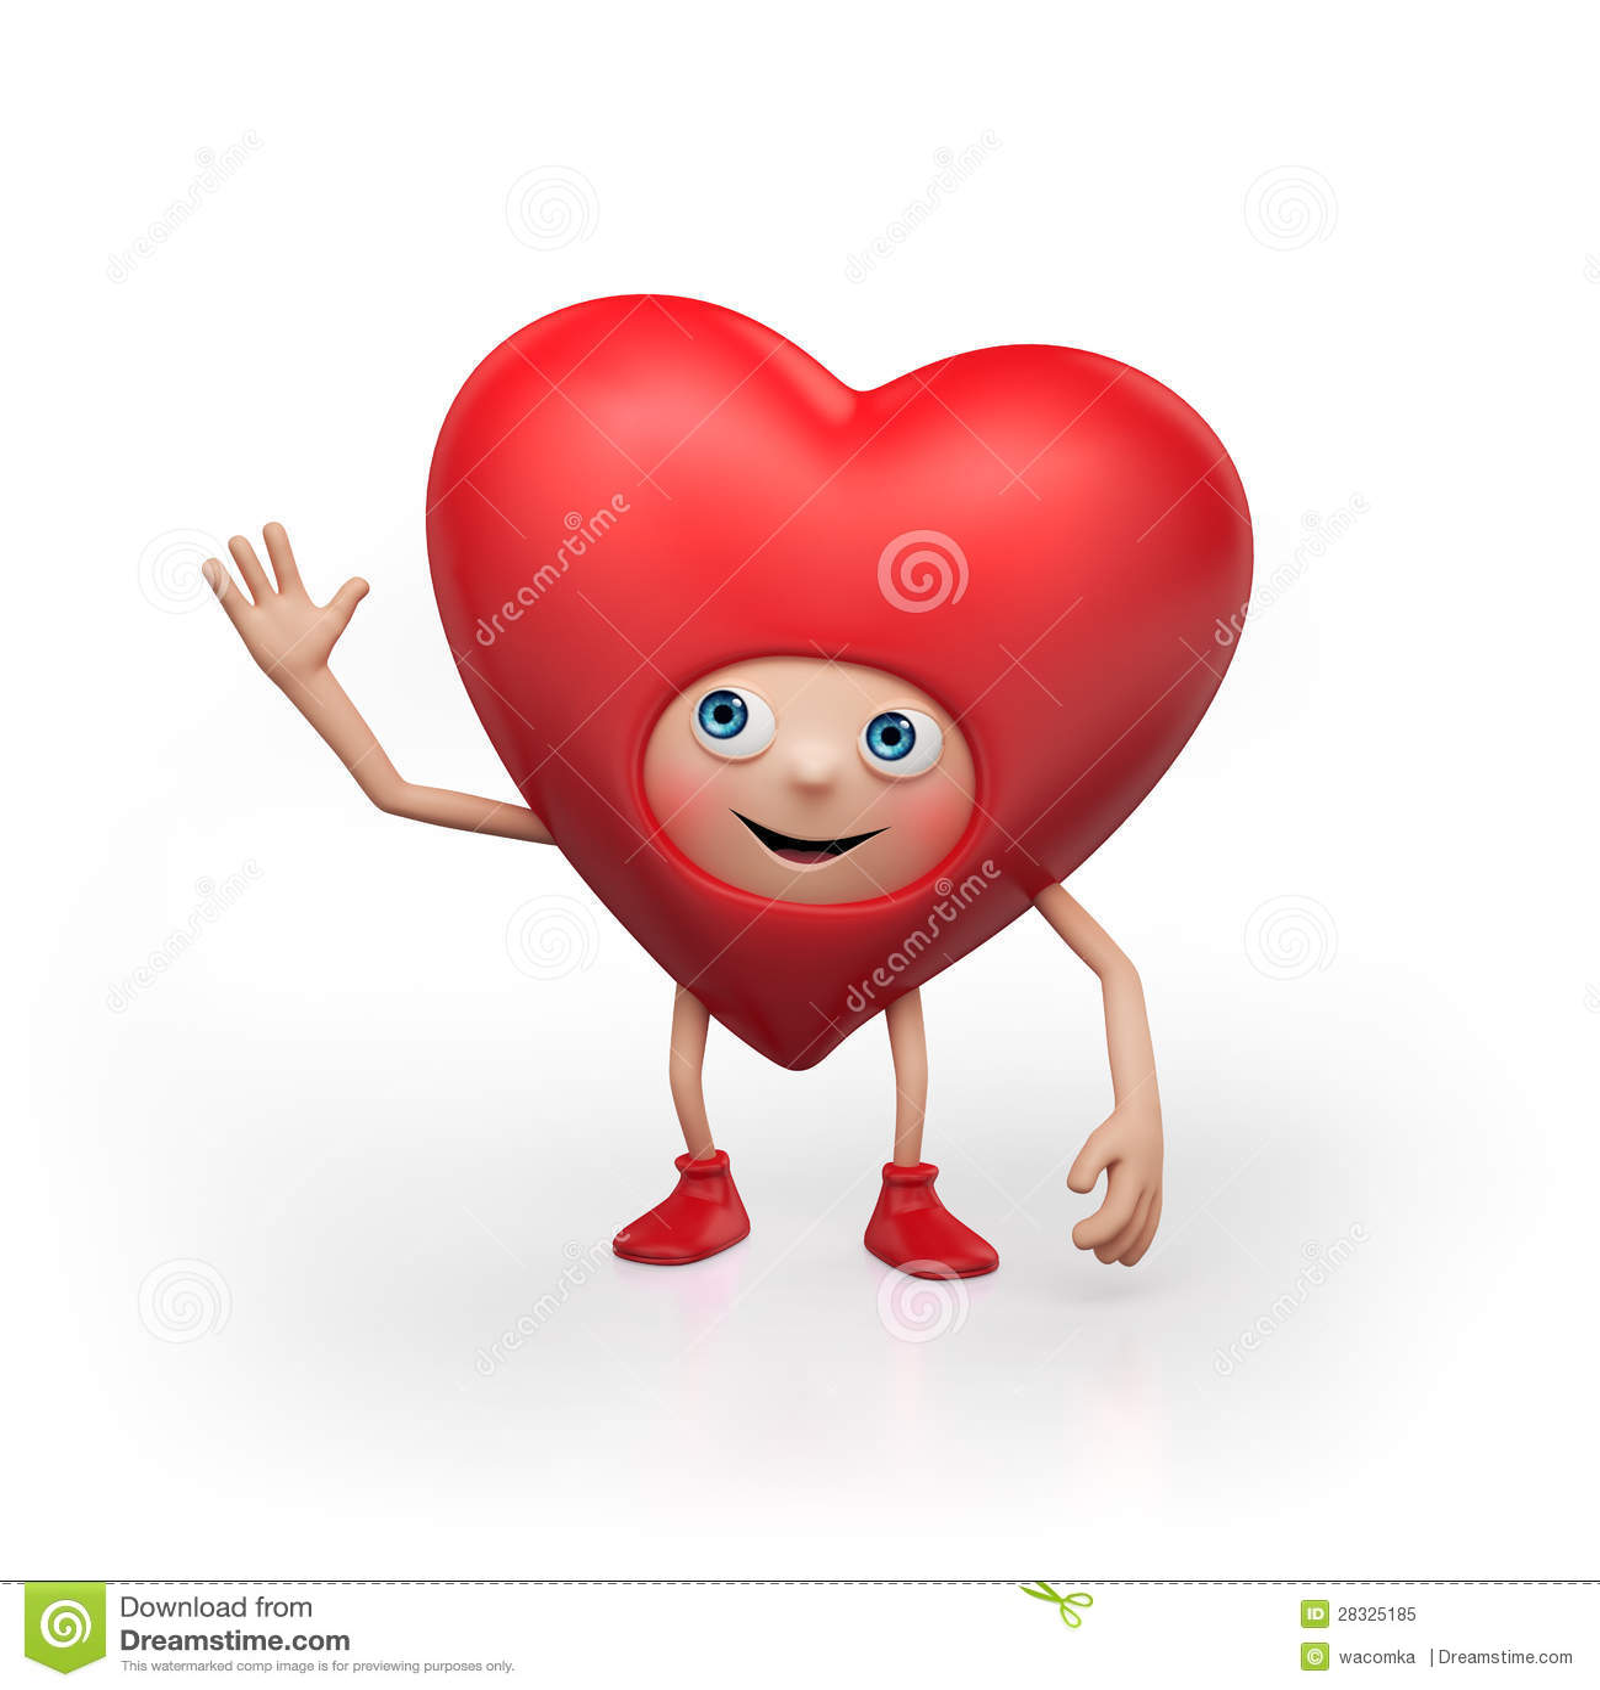 Cartoon Characters Valentines Day : Happy valentine heart cartoon character royalty free stock